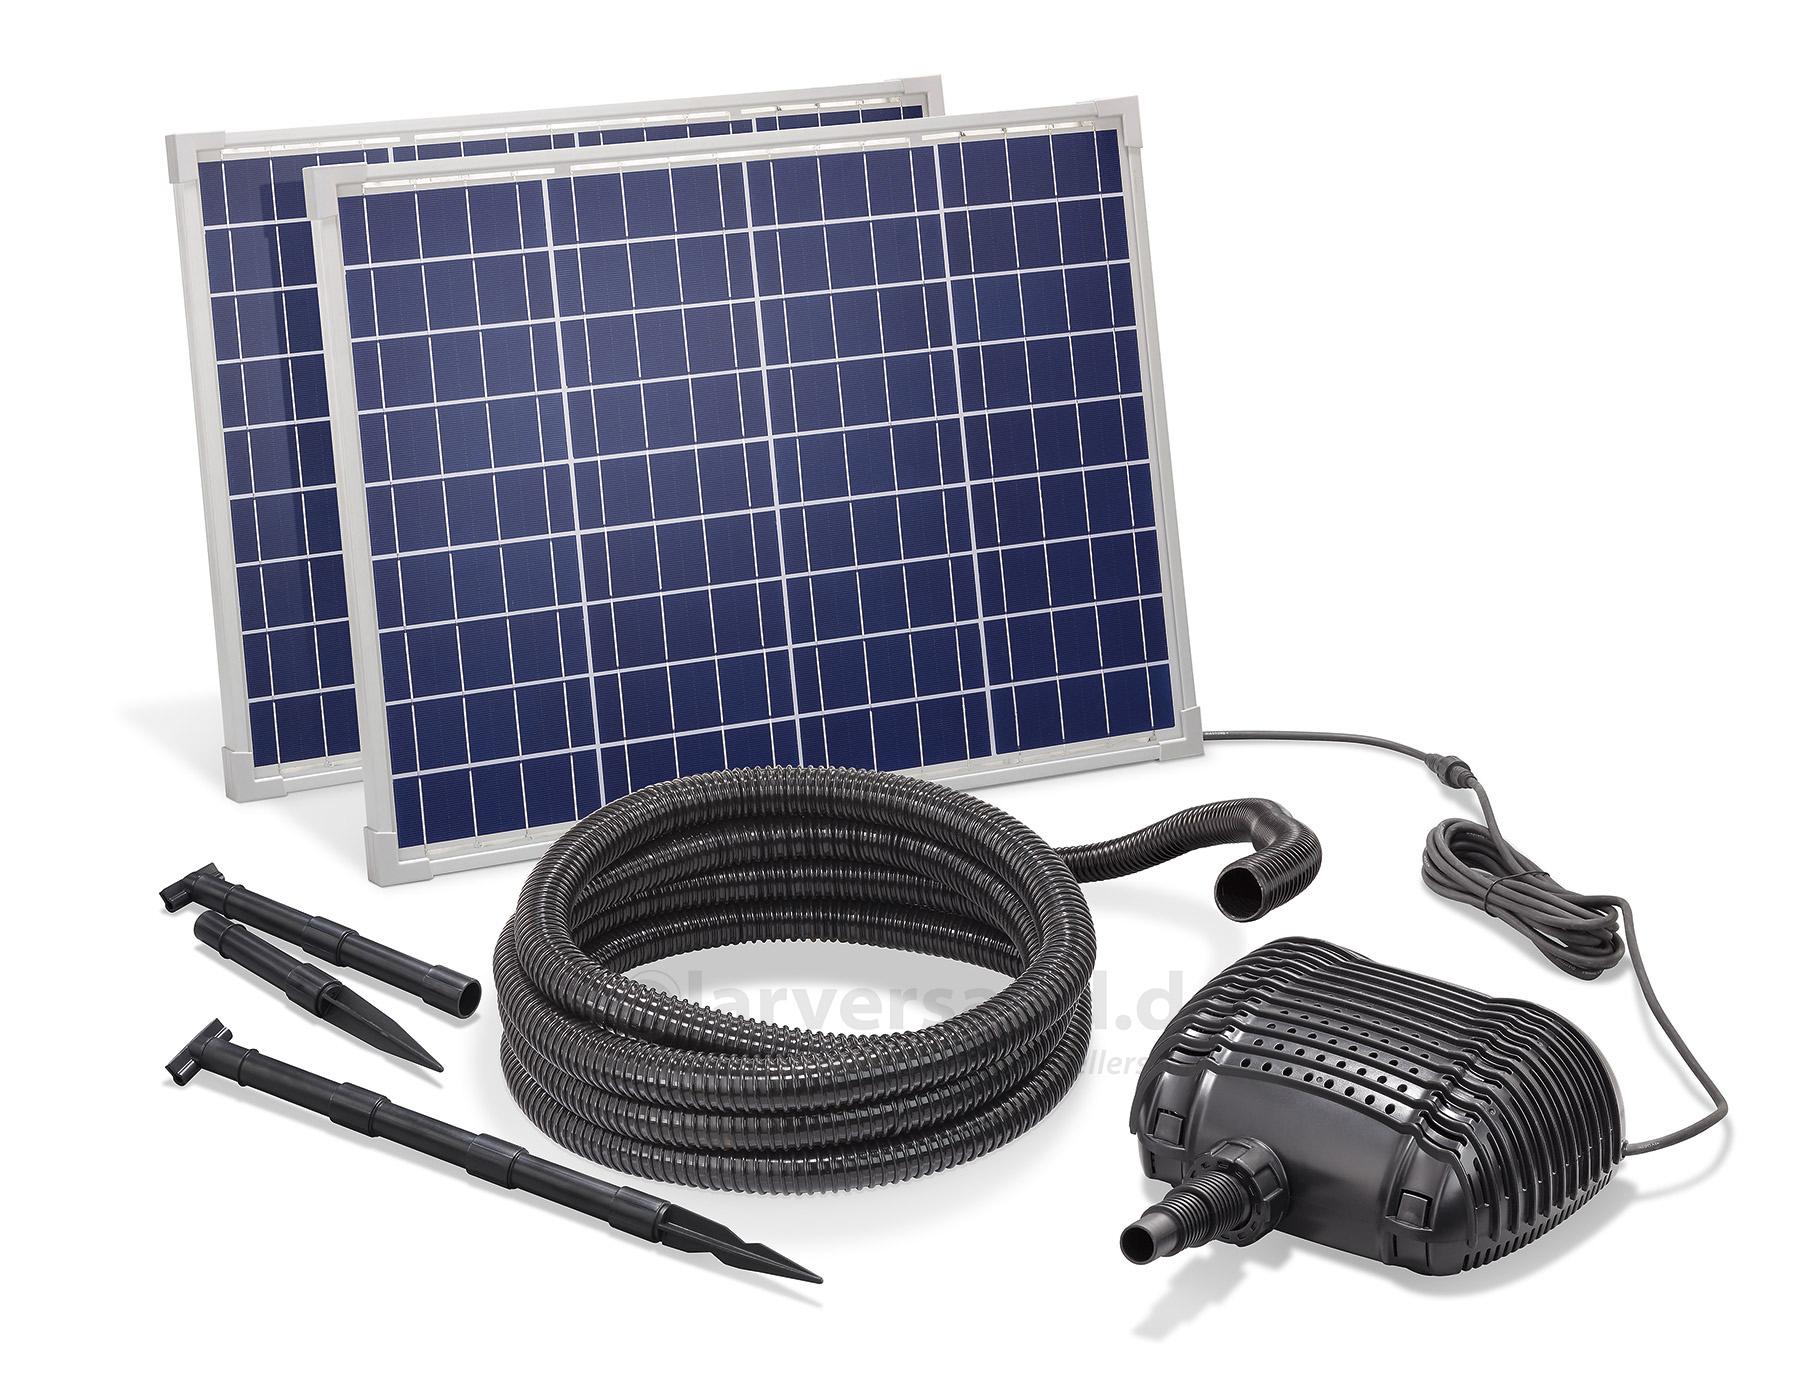 solar bachlaufset 100 5000 professional. Black Bedroom Furniture Sets. Home Design Ideas